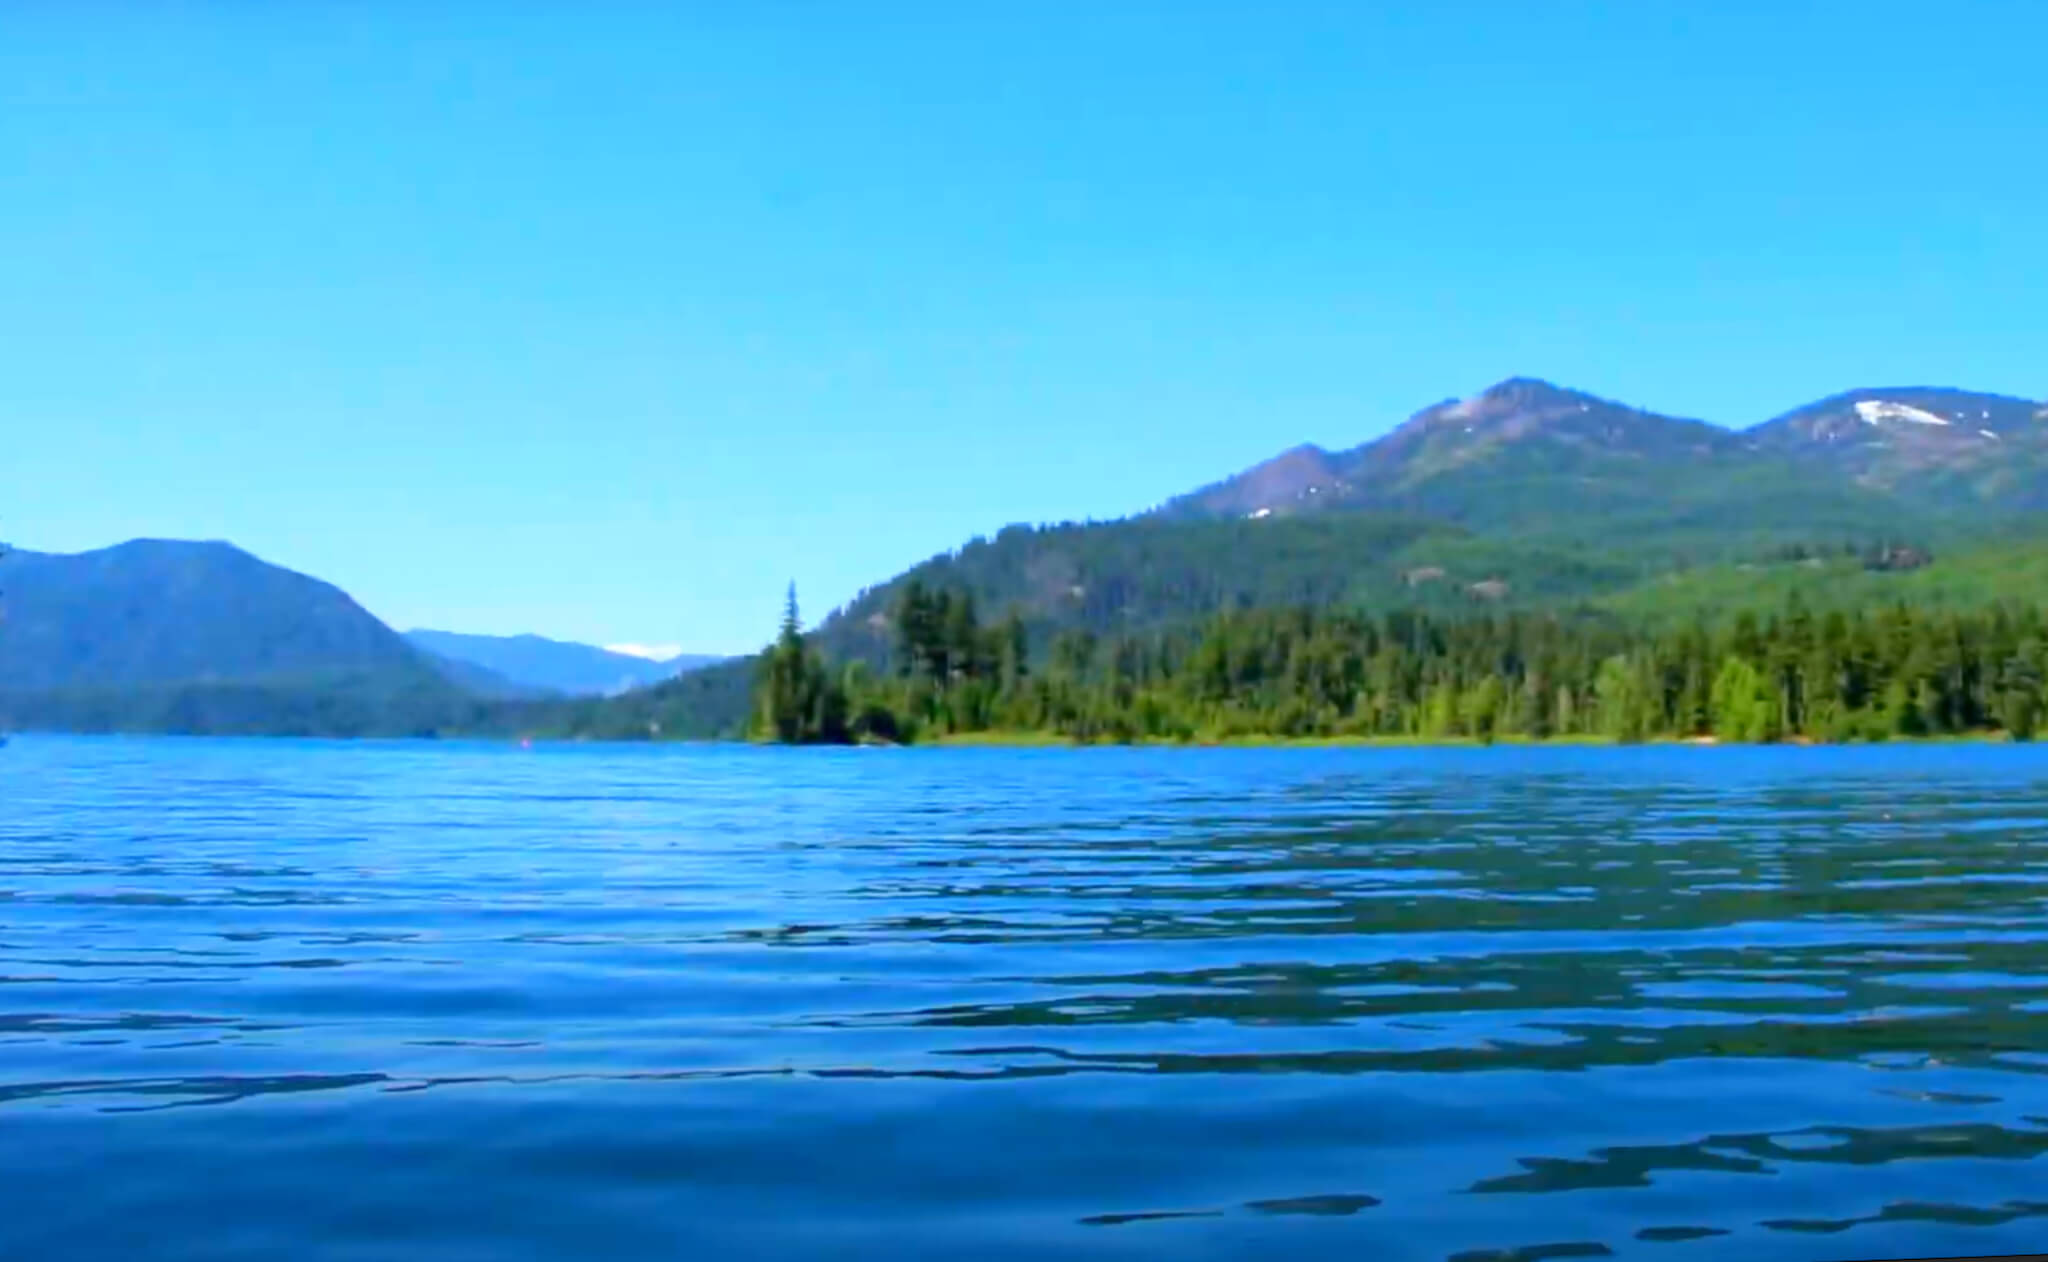 Kachess-Lake-Fishing-Report-Guide-Washington-WA-04